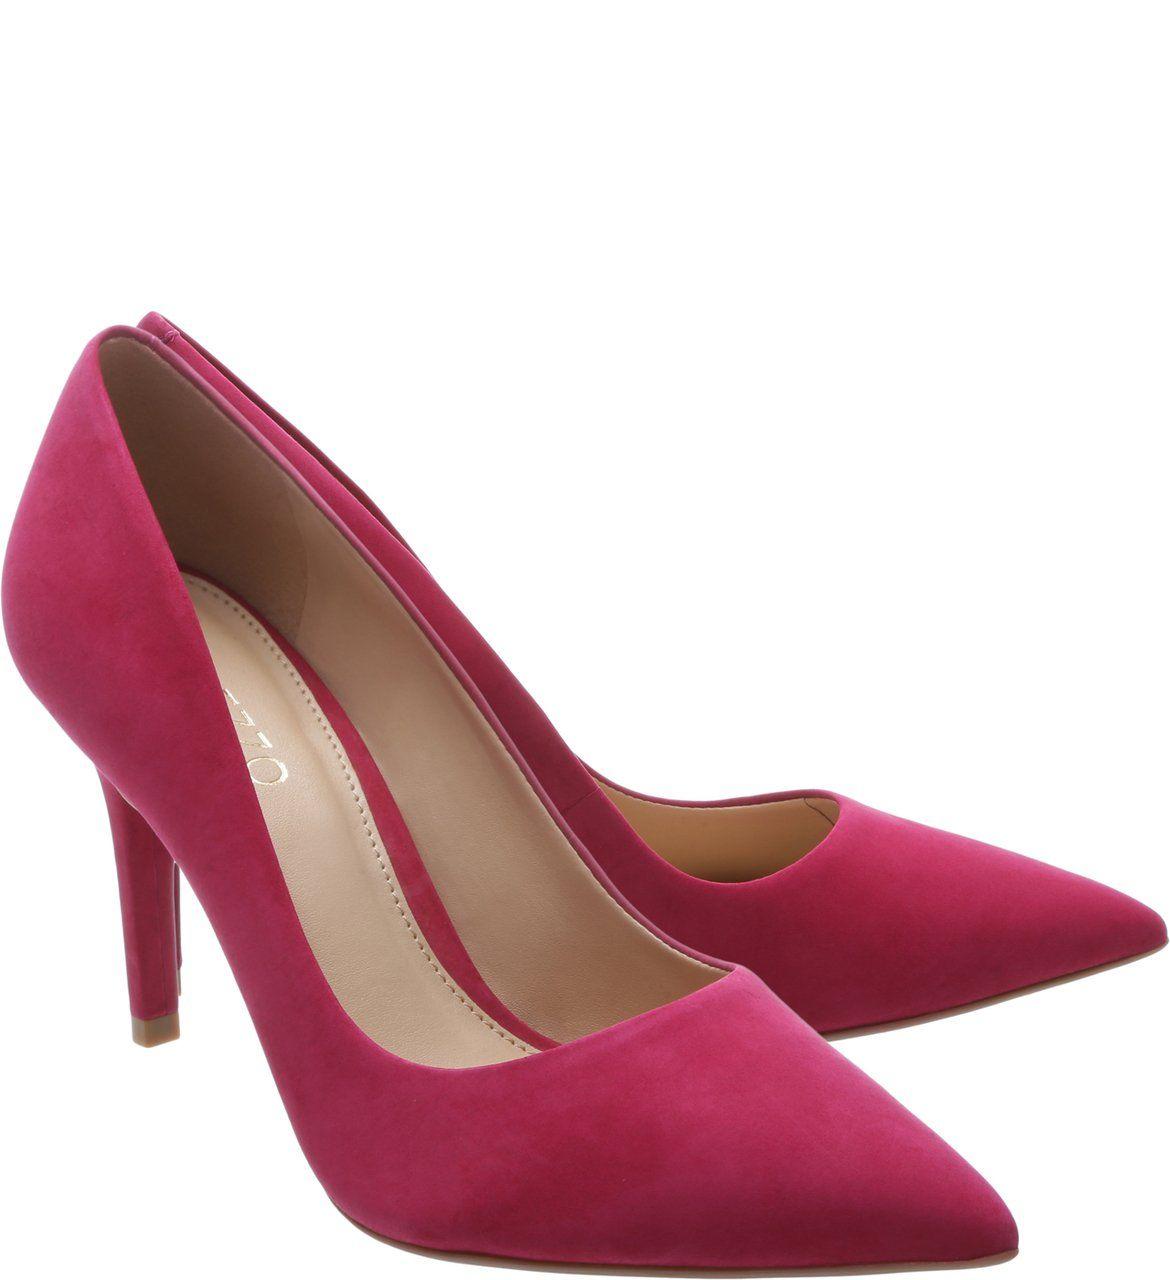 Sapato Scarpin Salto Alto Fino Verniz Rosa Pink – Todamulher